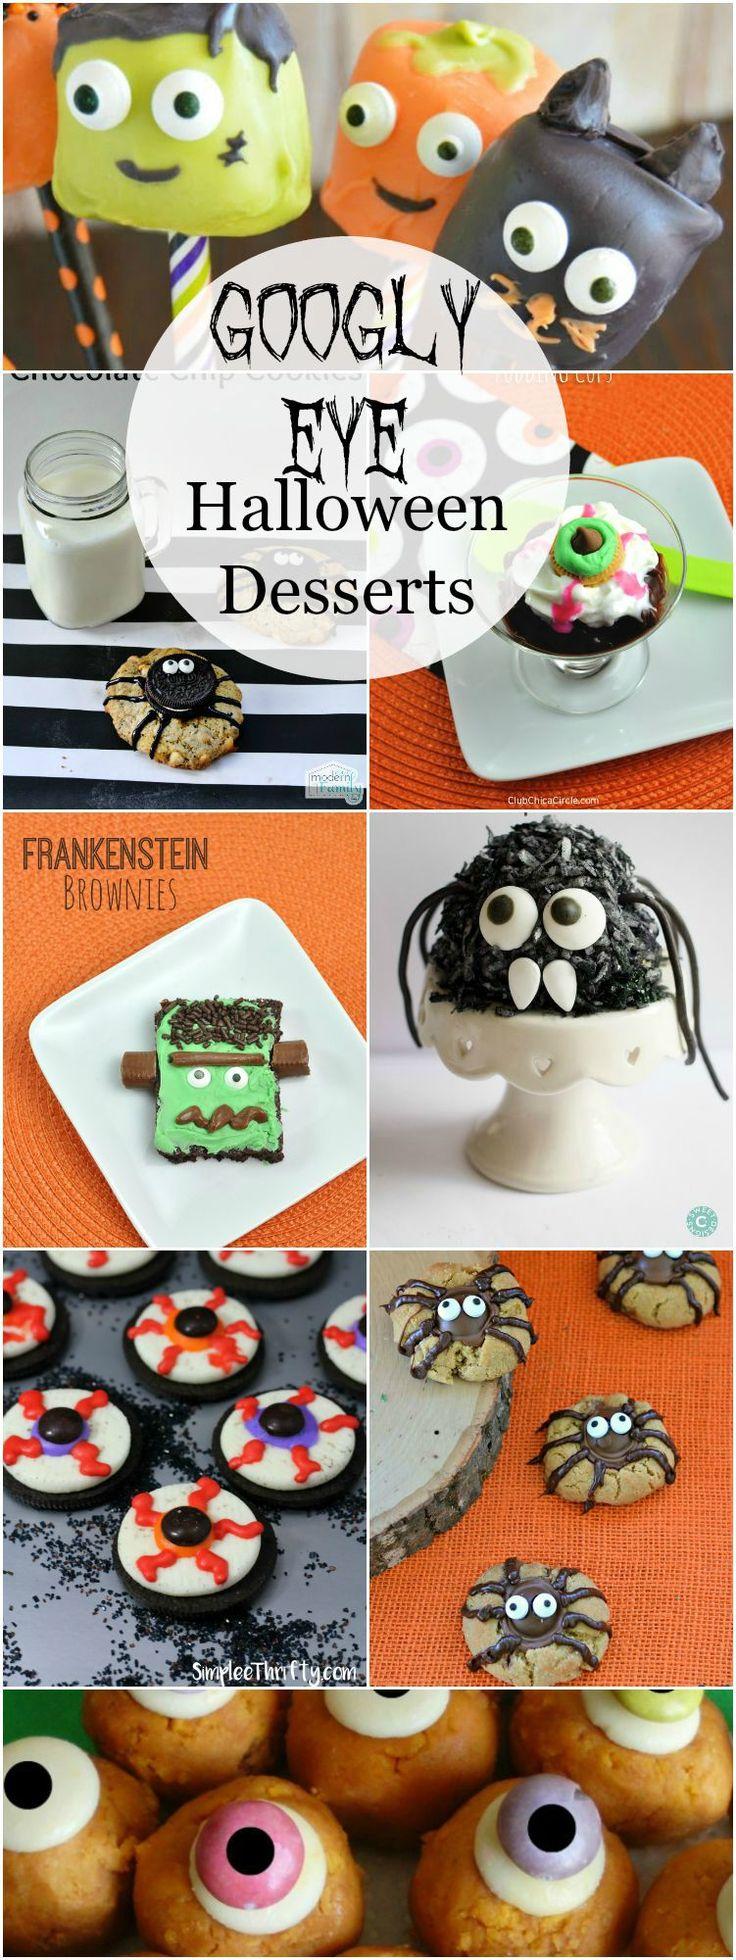 google eye halloween desserts - Halloween Desserts For Parties